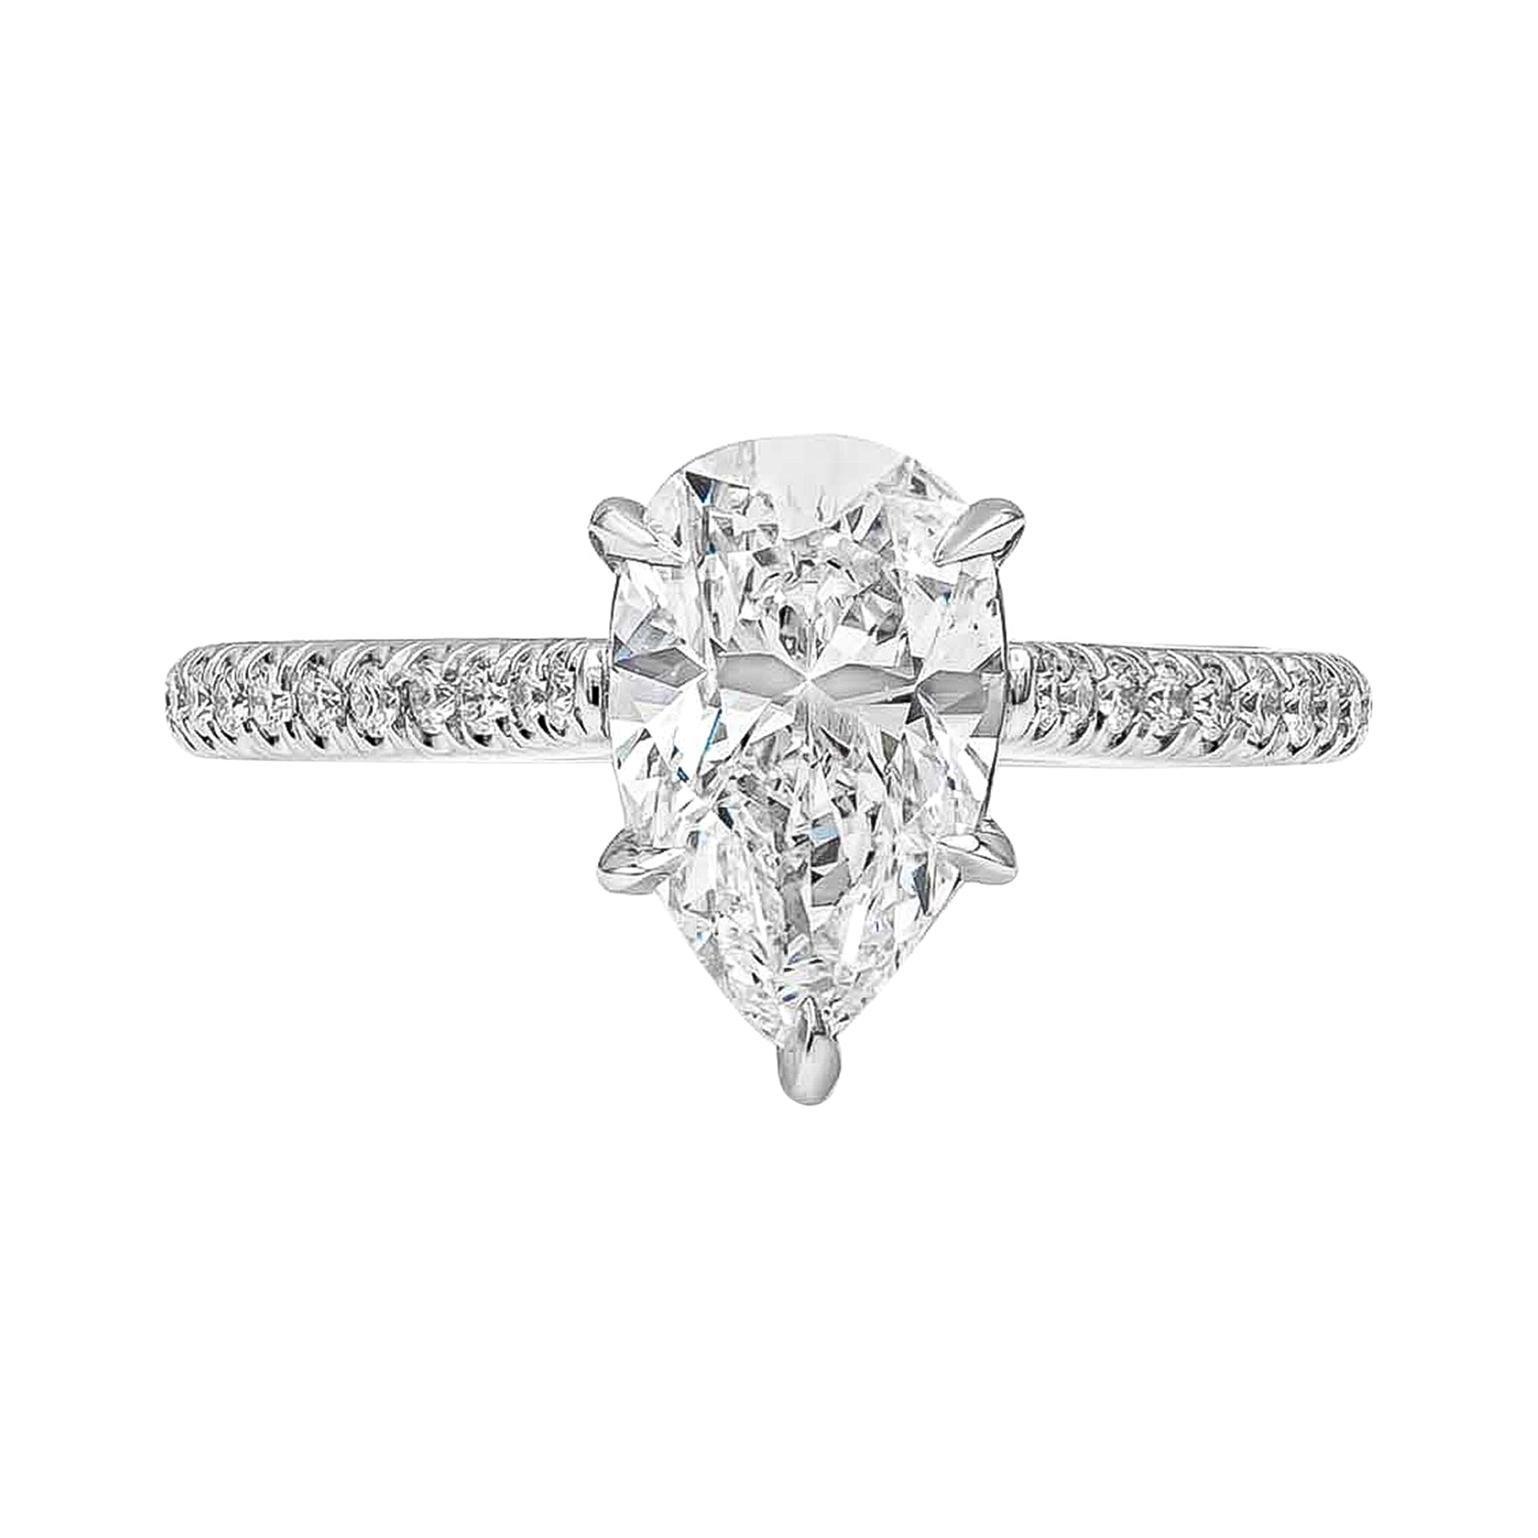 GIA Certified 1.84 Carat Pear Shape Diamond Engagement Ring